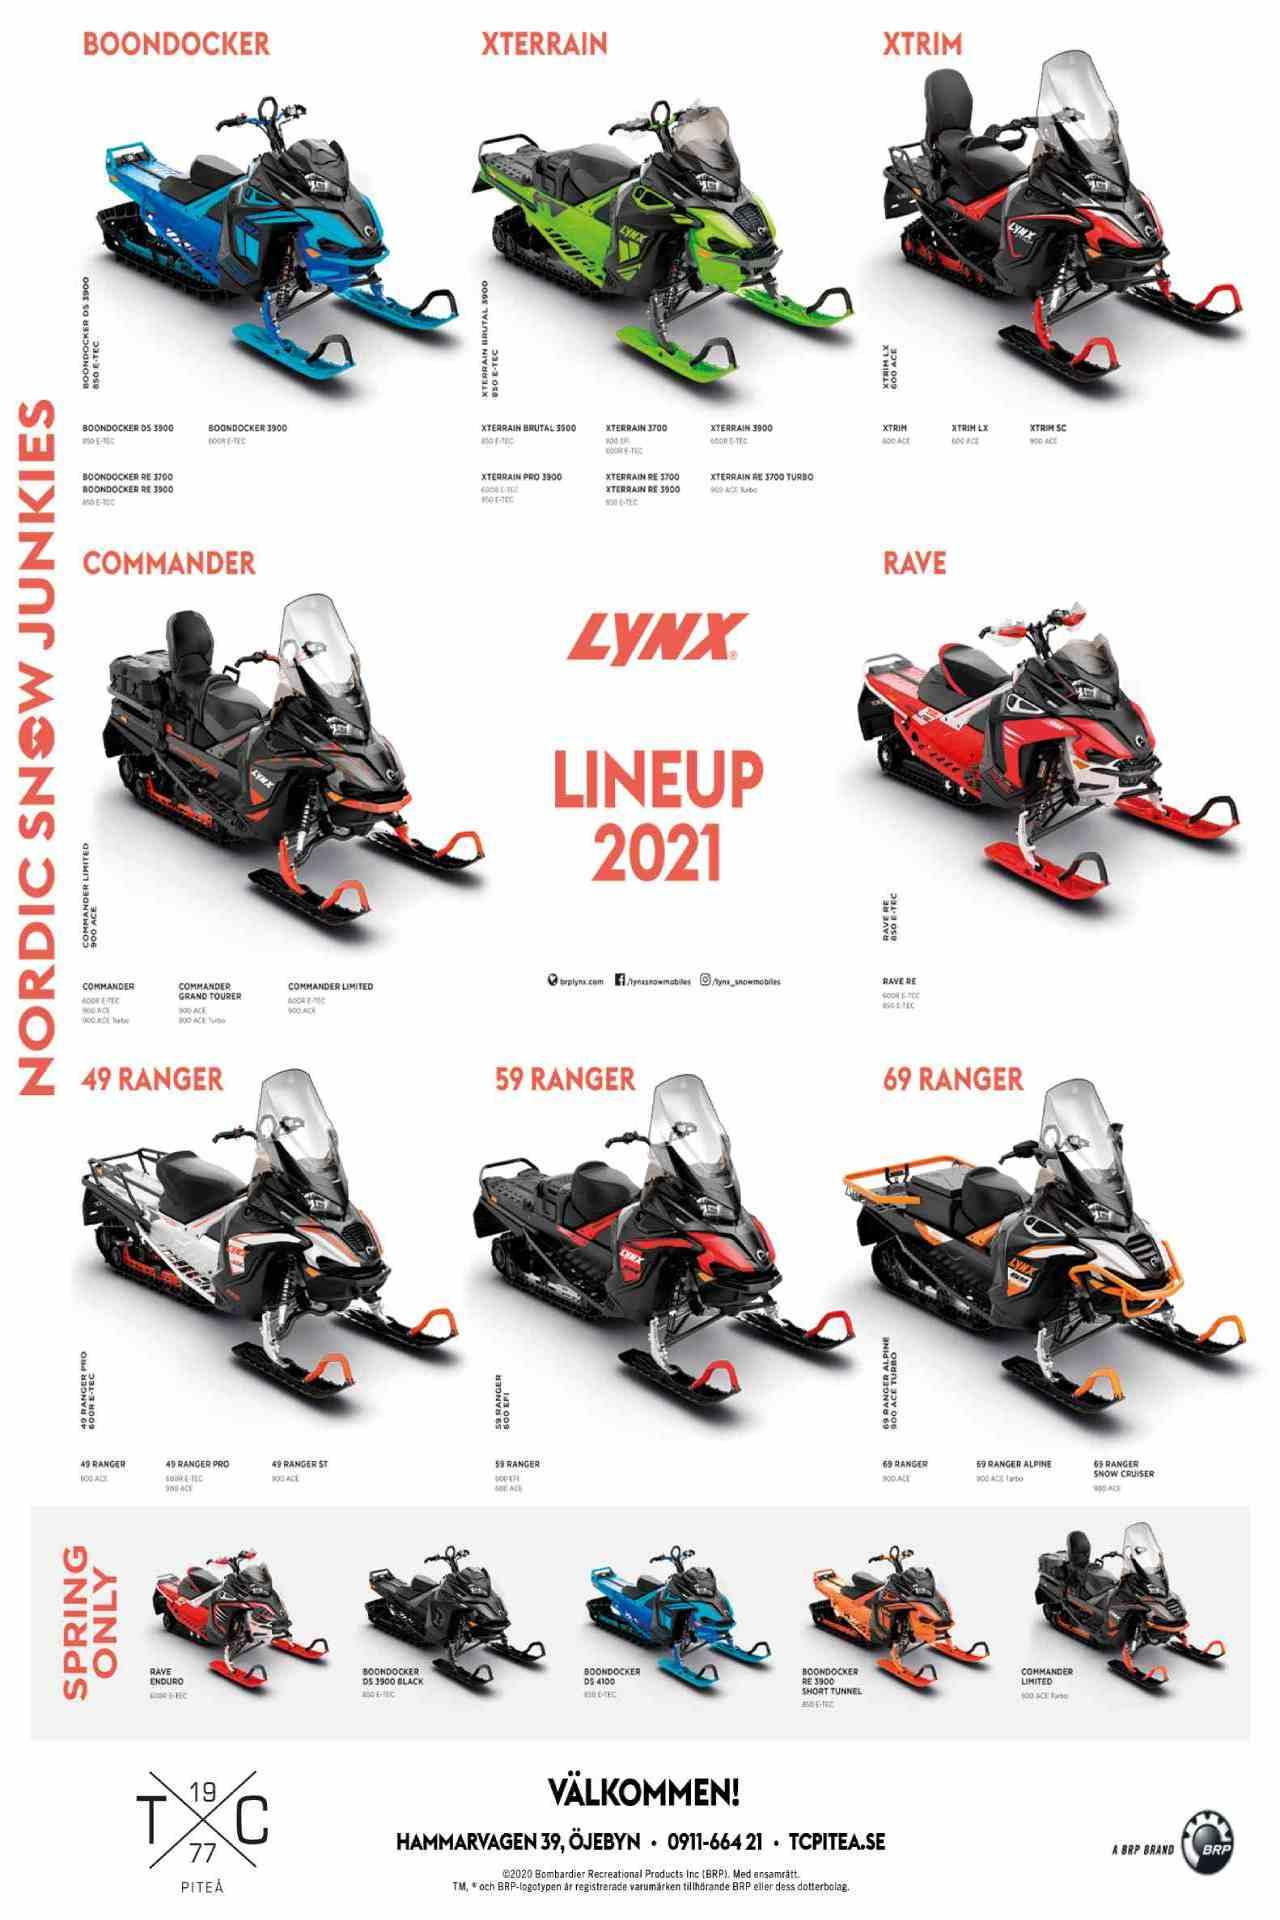 lynx lineup 2021 snöskoter